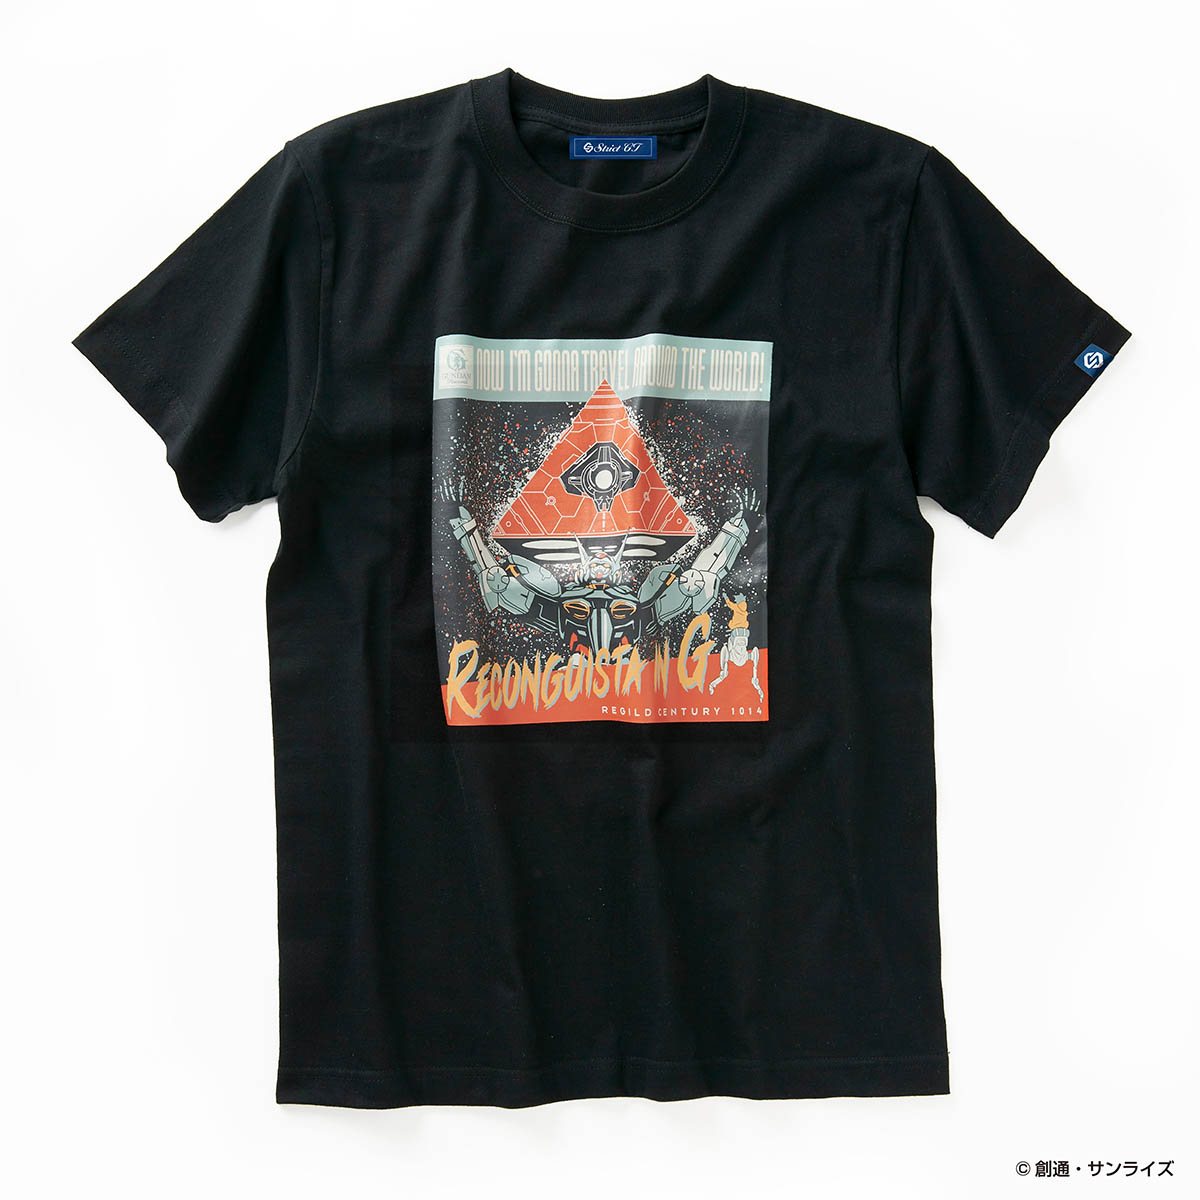 STRICT-G GUNDAM RECORDS 『Gのレコンギスタ』Tシャツ